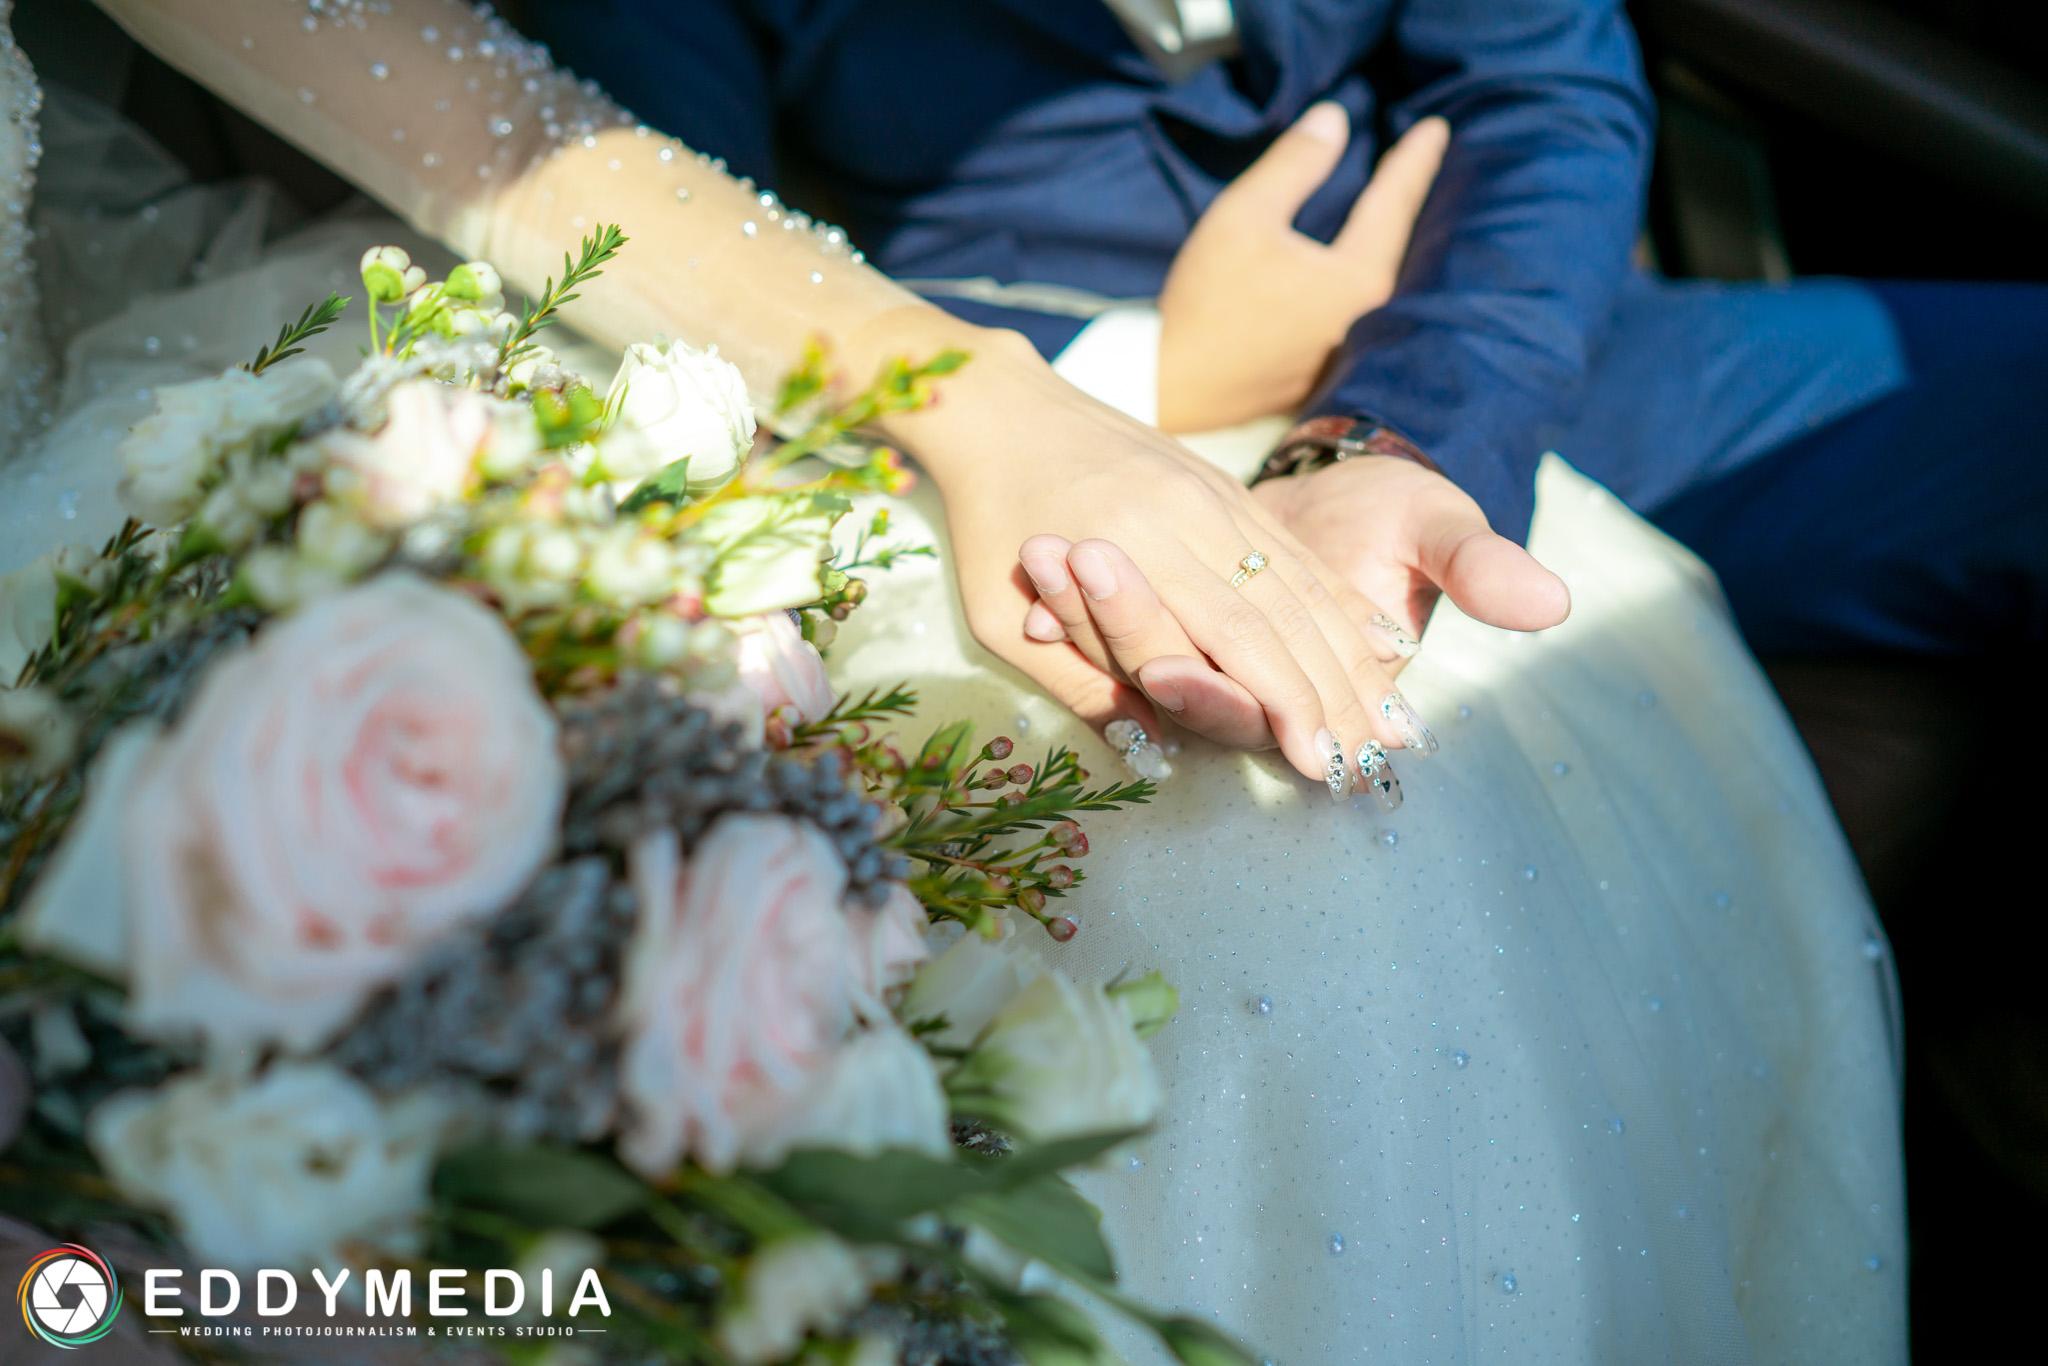 Phongsucuoi Vanhoa Hailong Diemmy EddyMedia 31 lấy vợ giàu